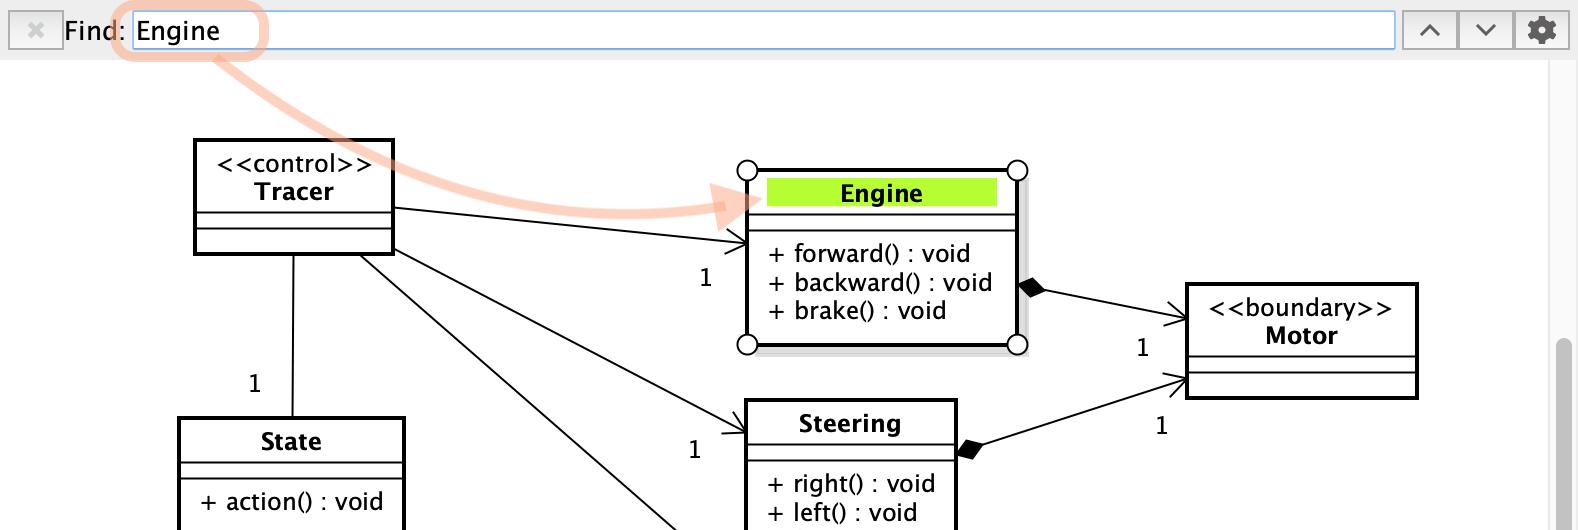 Diagram Search Sample